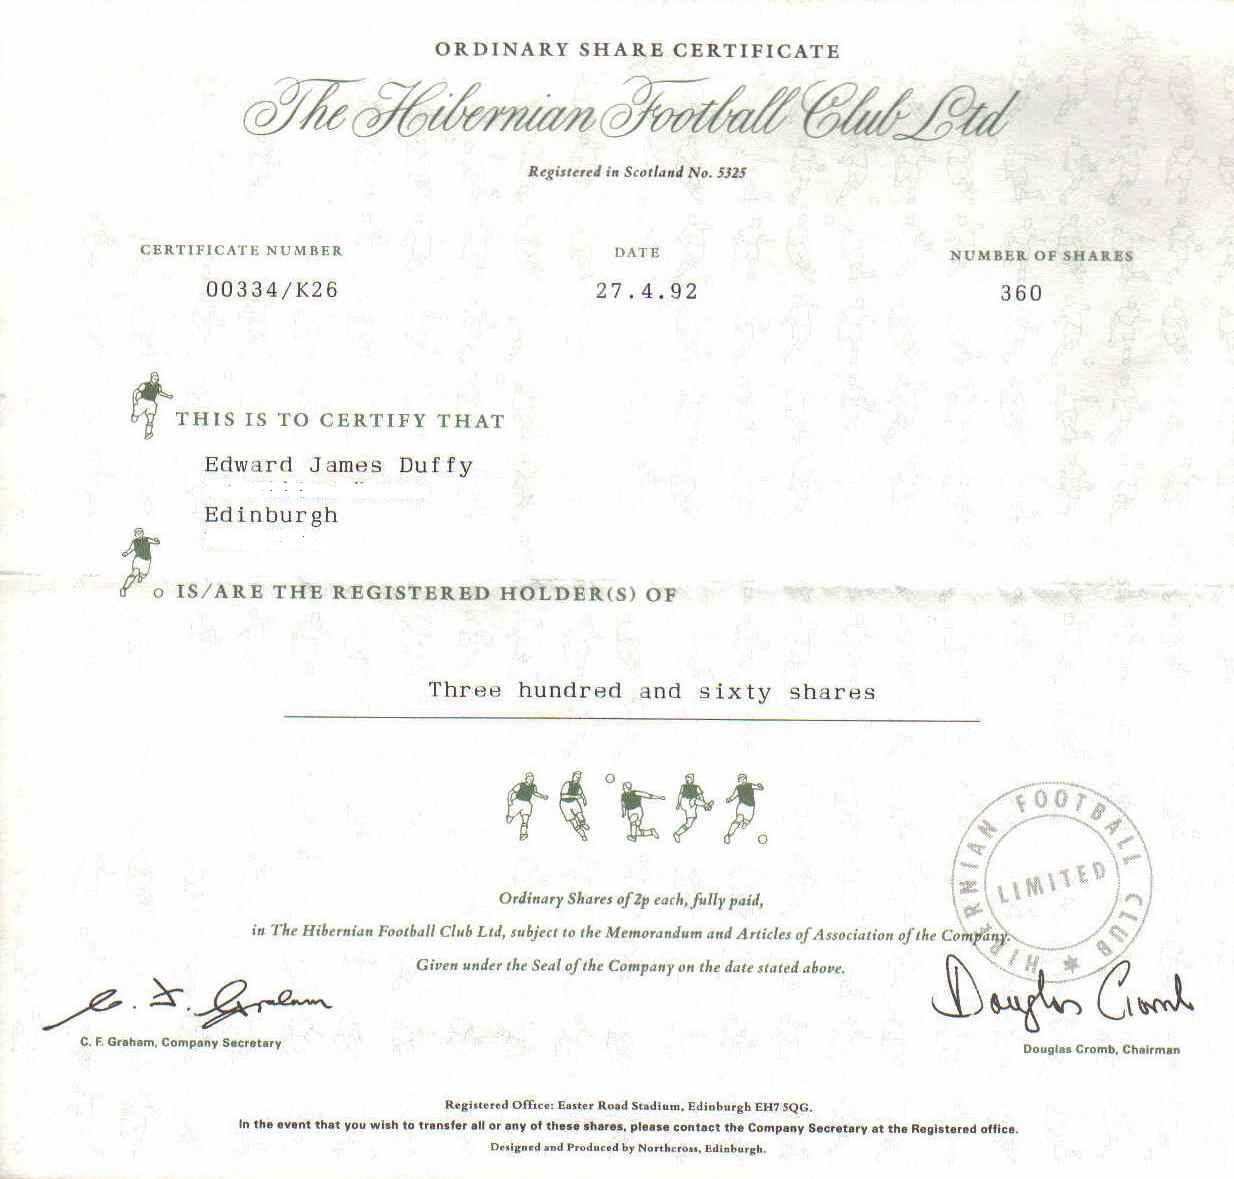 Hibs share certificate 1992 saint patricks branch hibs share certificate 1992 1betcityfo Gallery